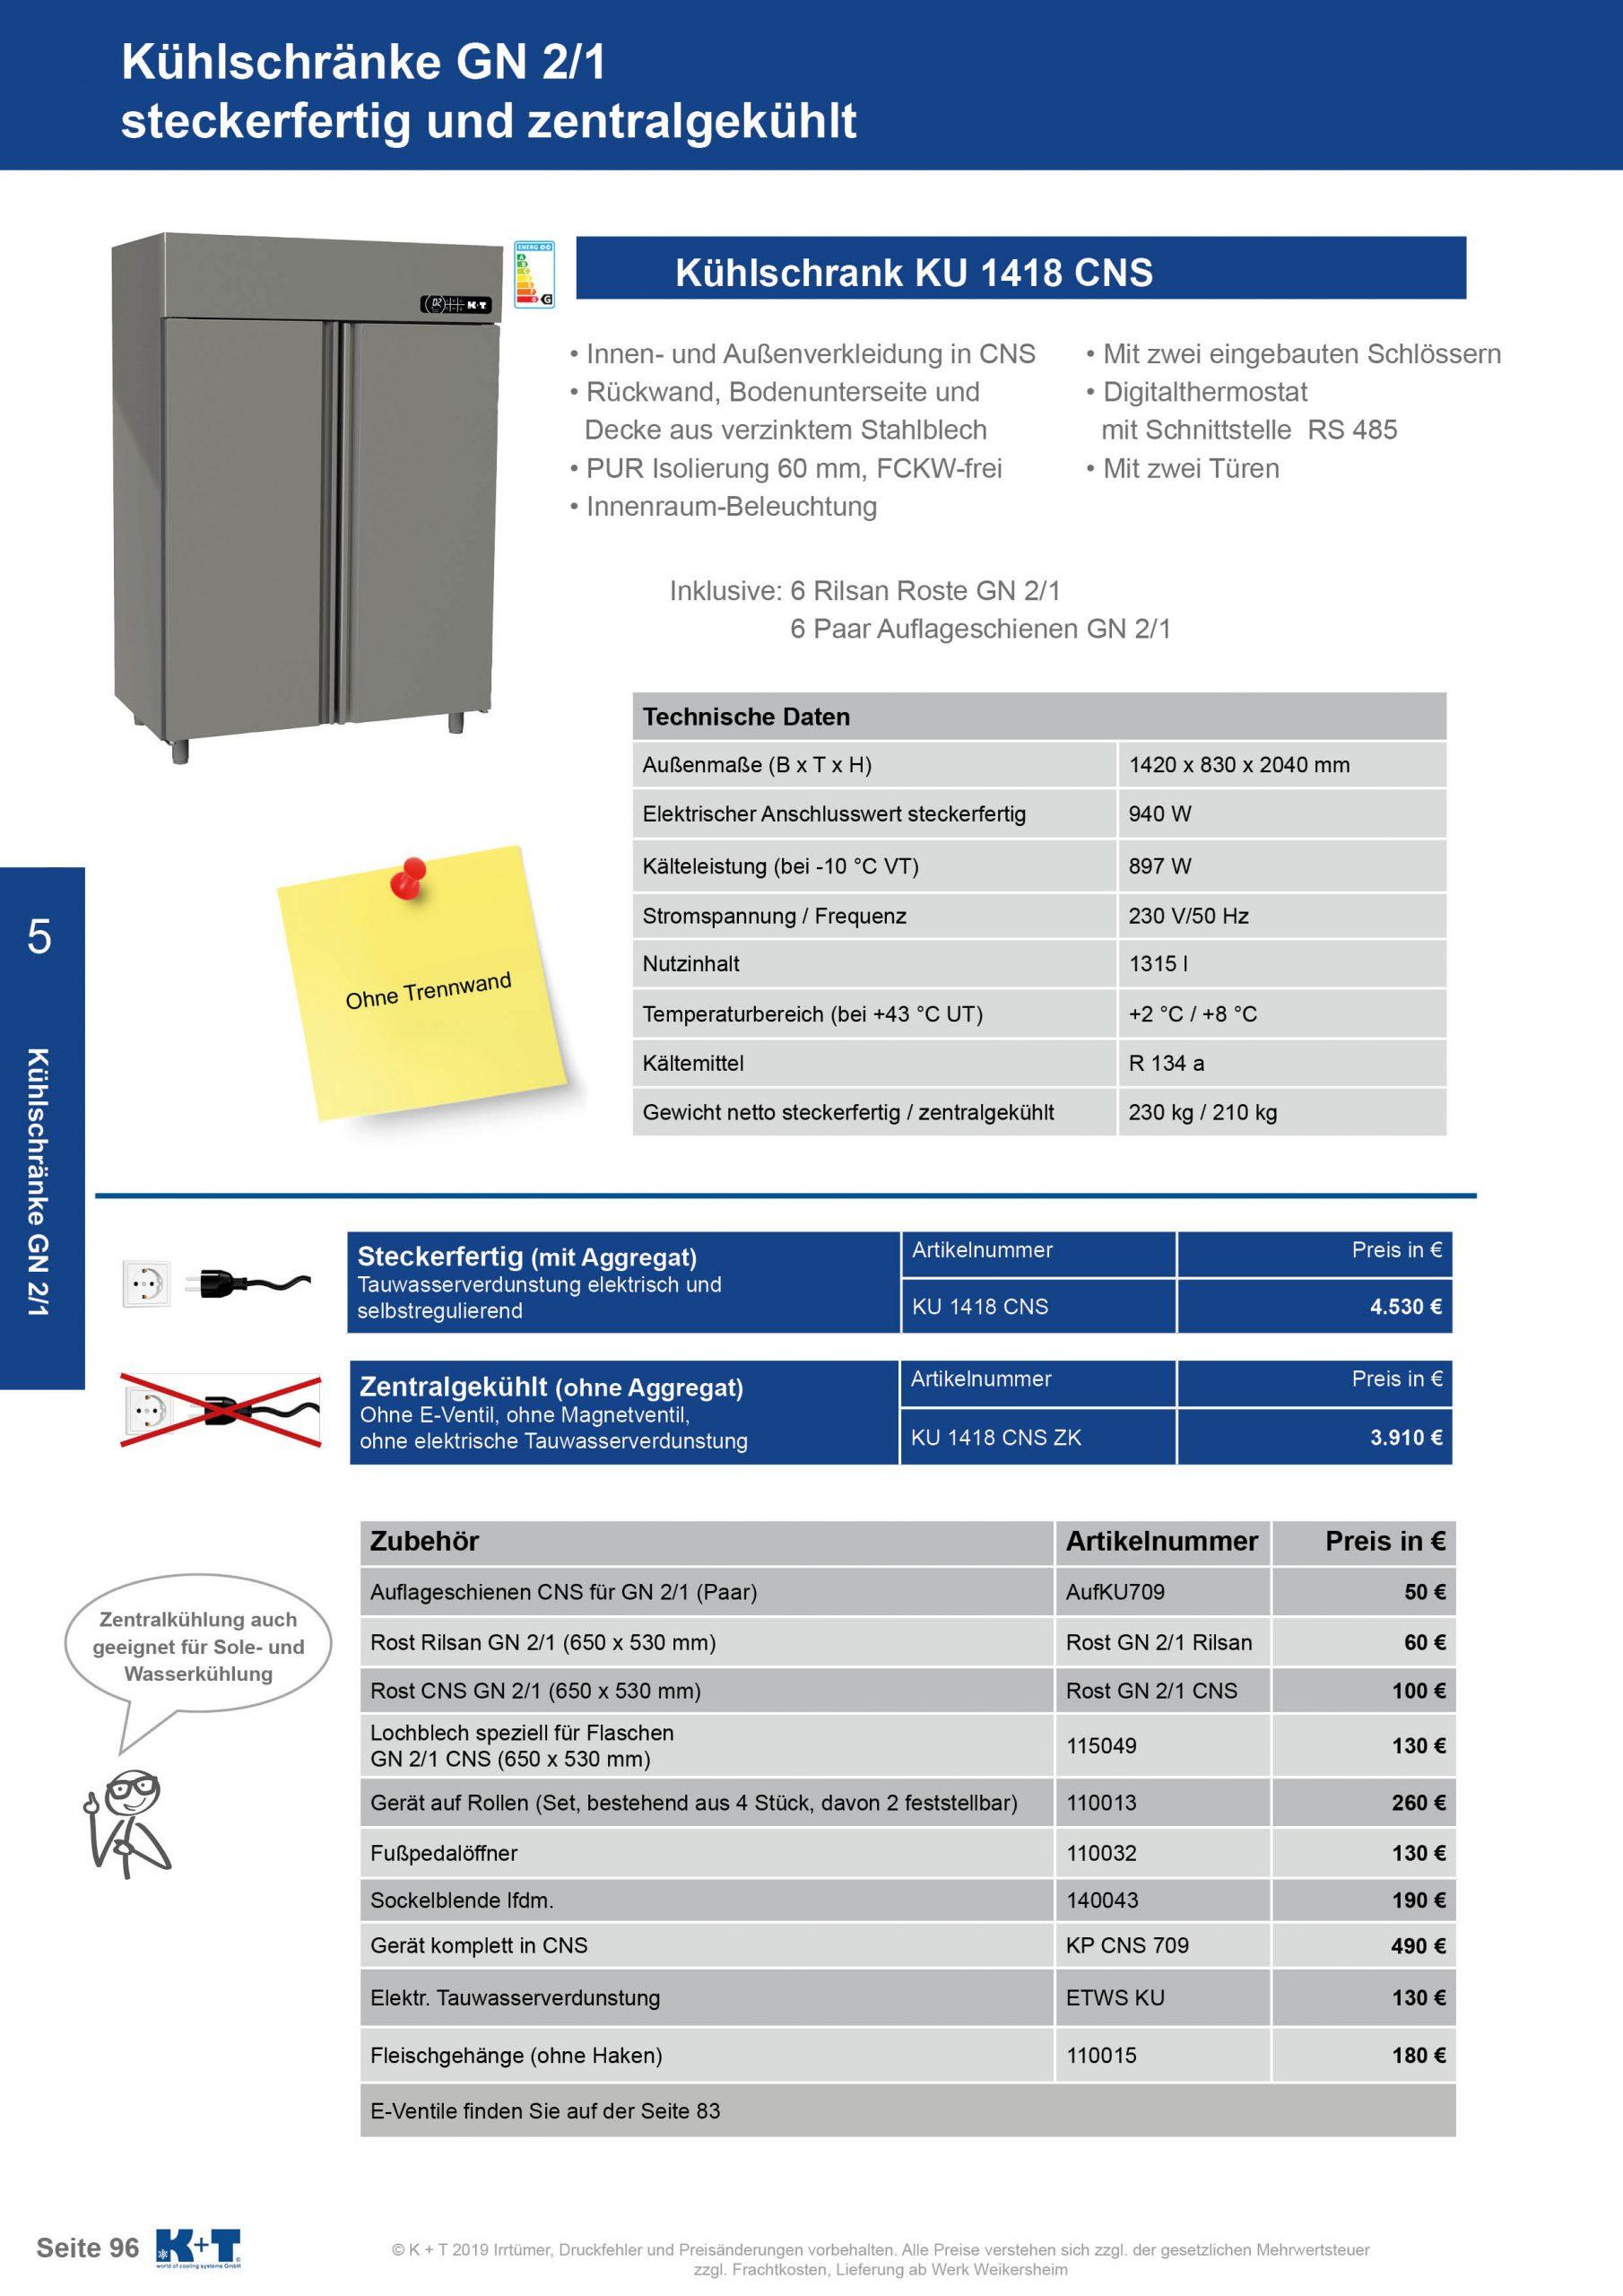 Kühlschränke GN 2_1 Doppeltürenkühlschrank steckerfertig